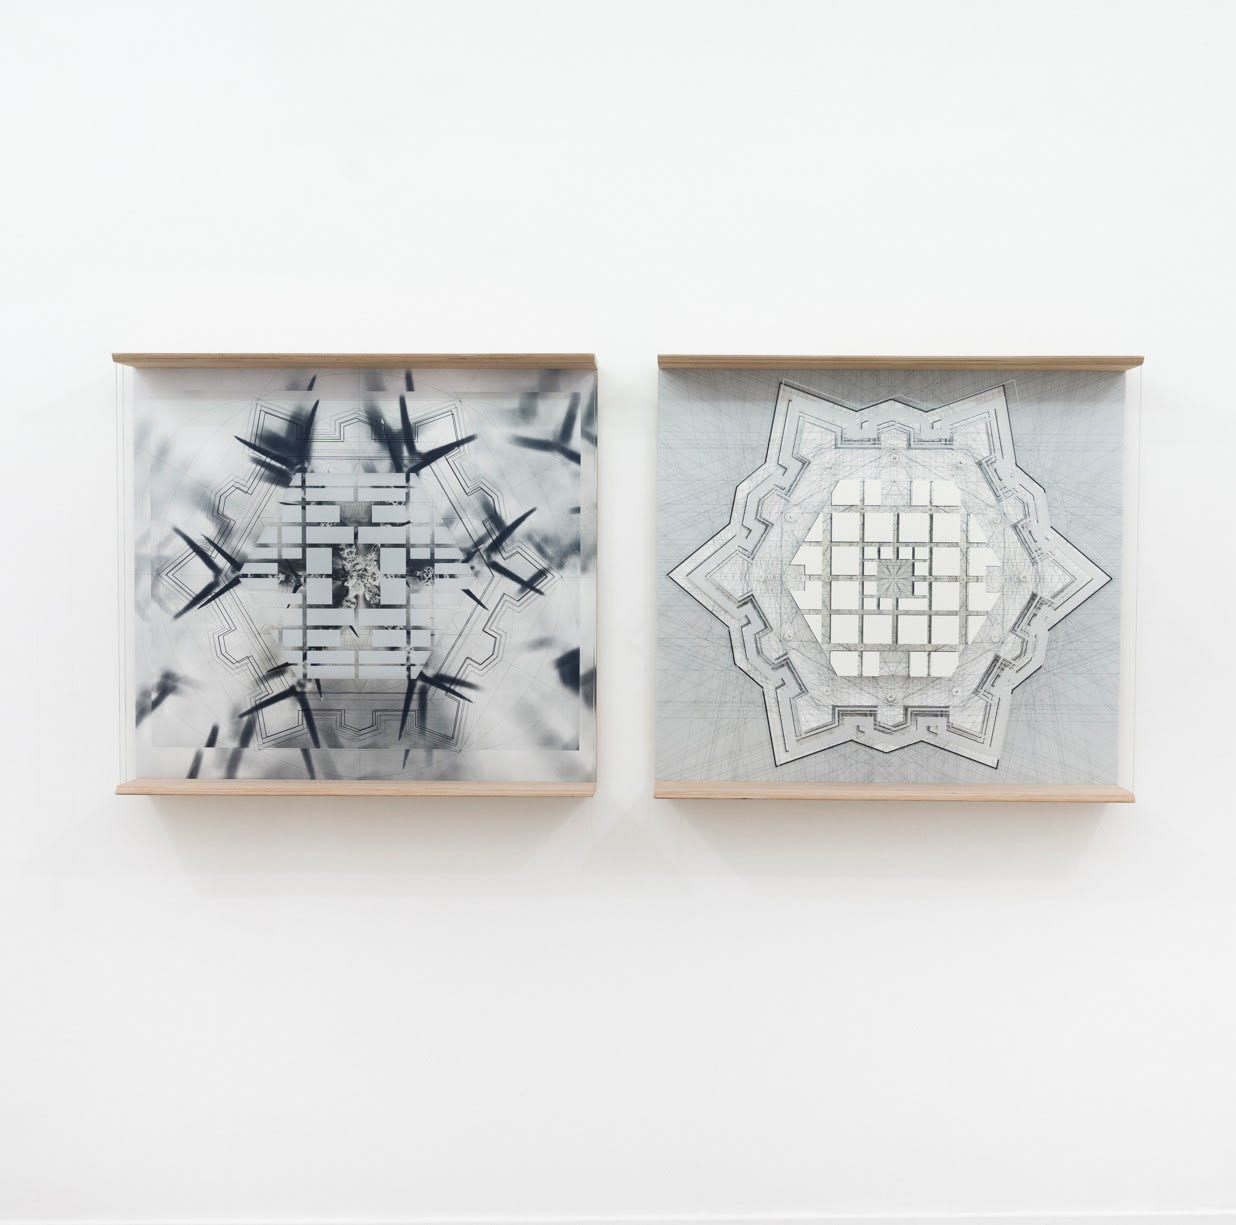 Michele Guido, robn_07. 05.14_27.08 _hexagon _study for ideal city _pietro cataneo _avola _1567/2018 (diptyc), 2018